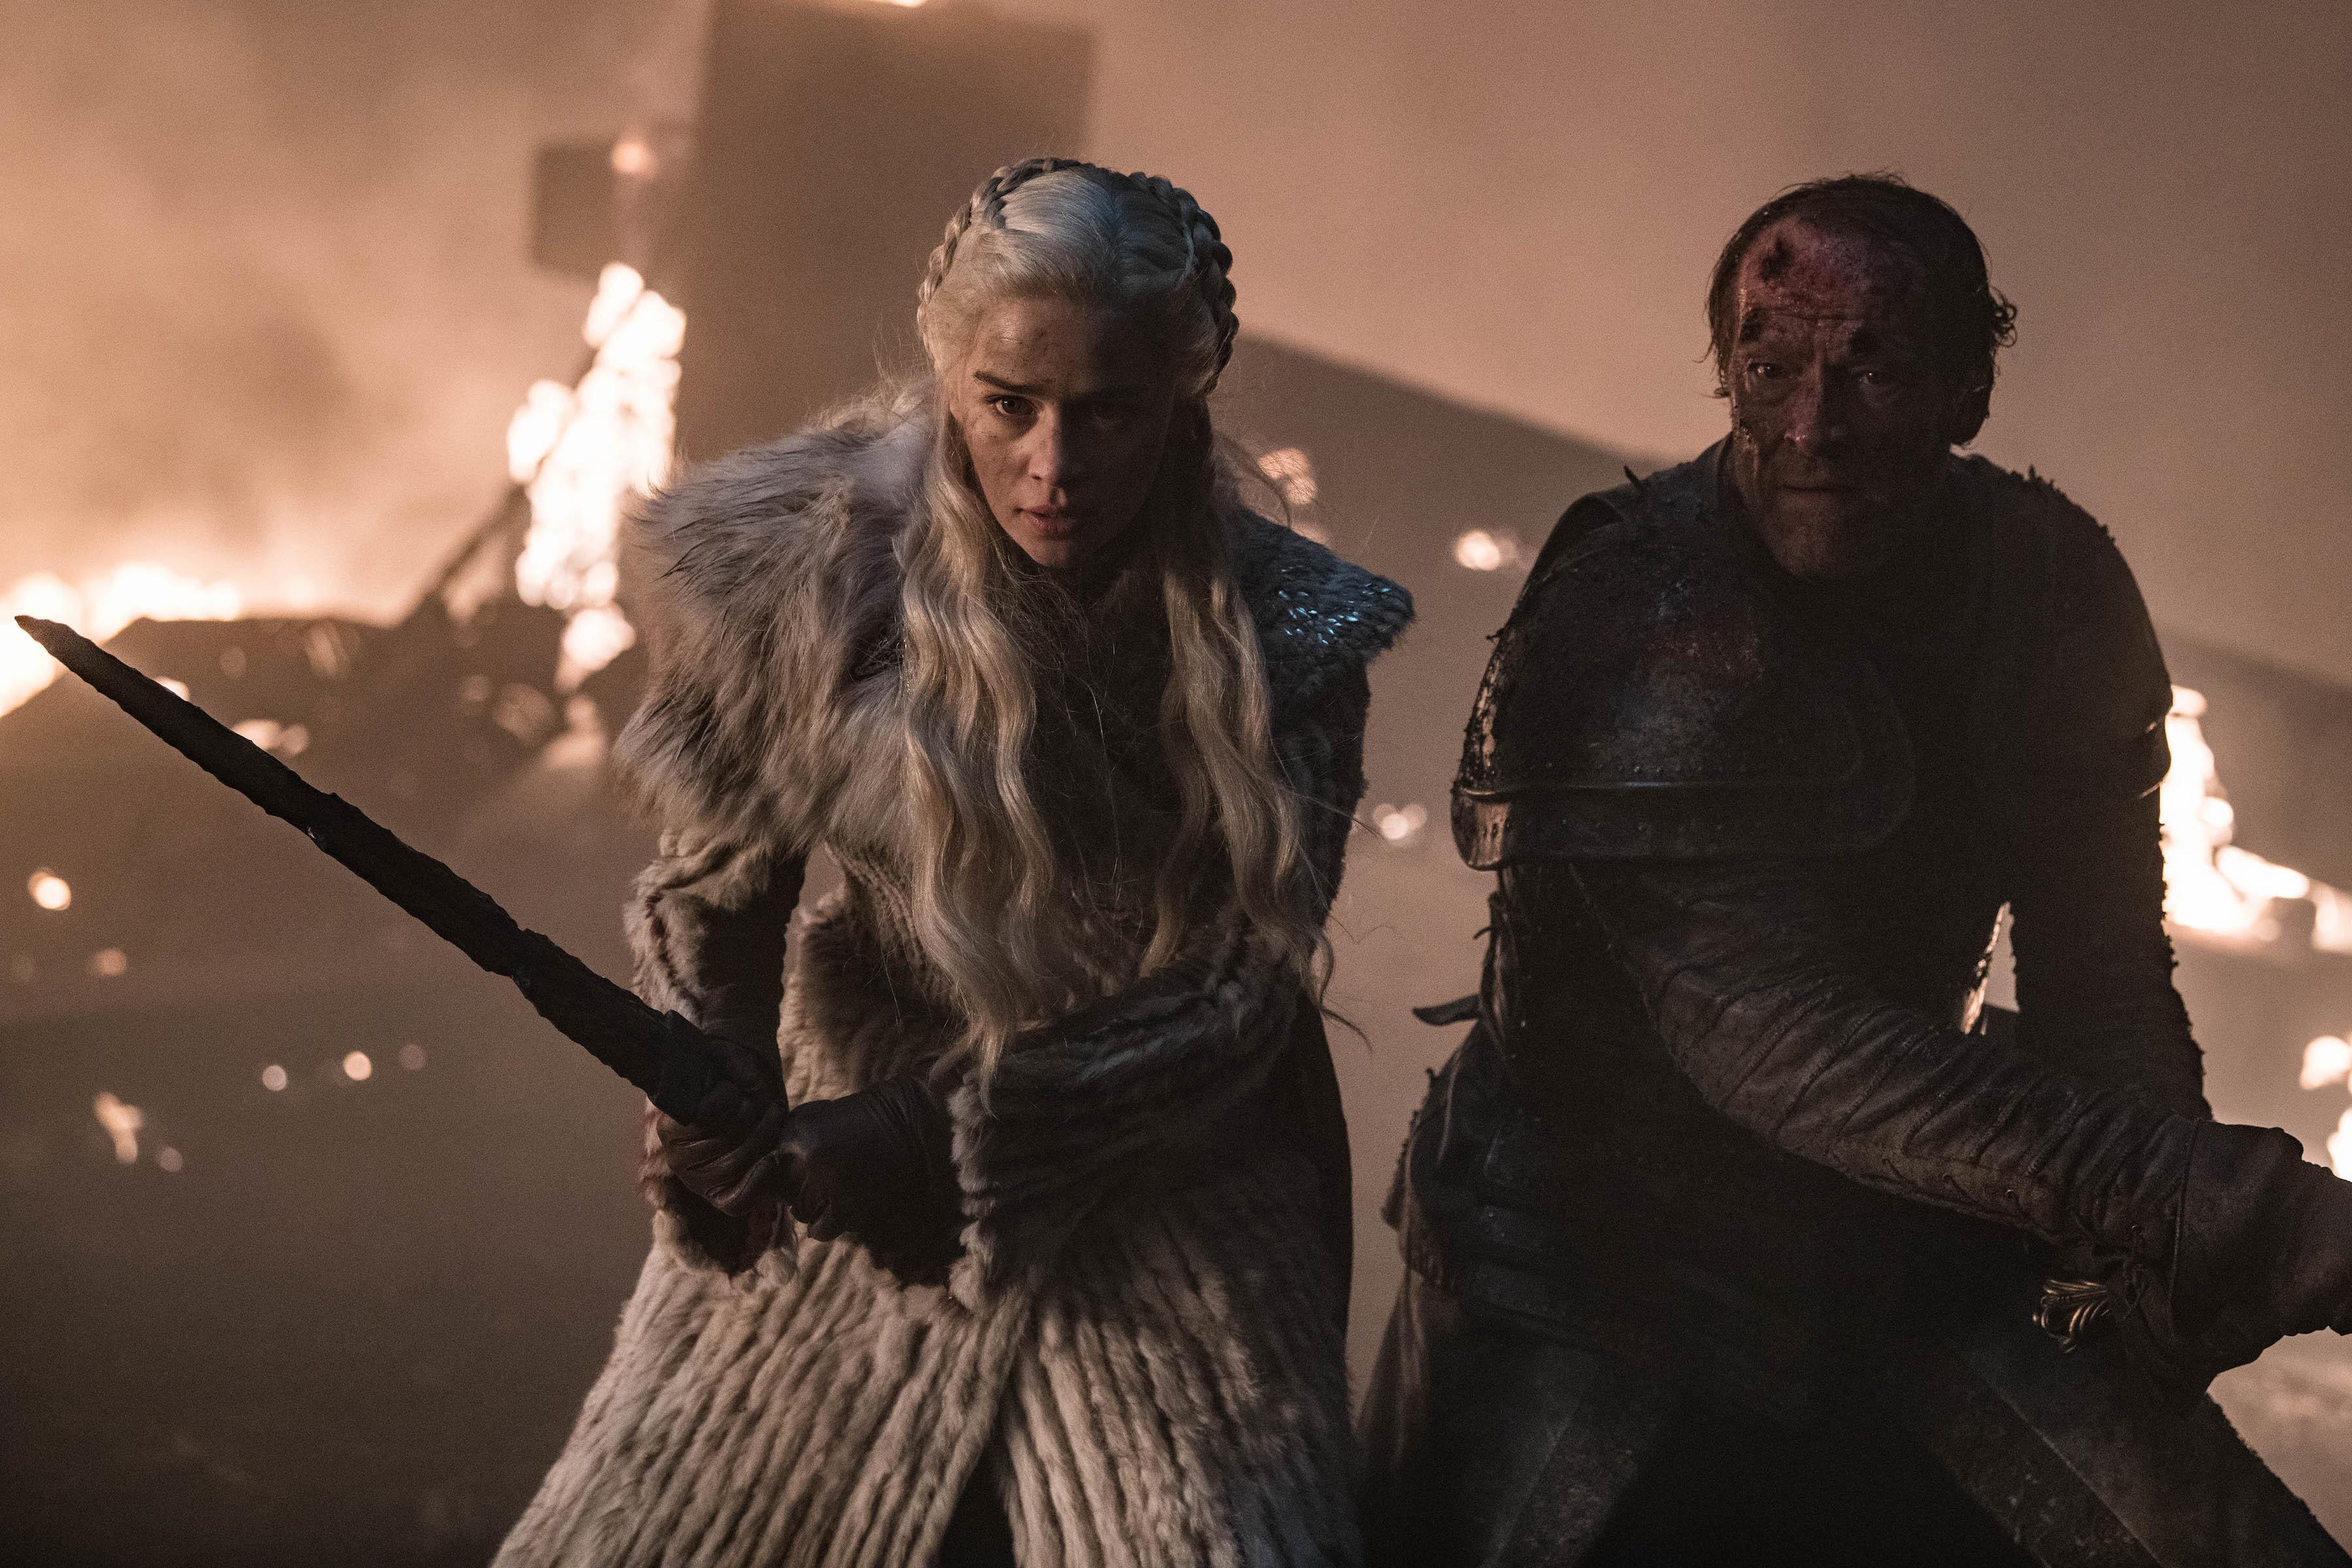 8x03 - The Long Night - Daenerys and Jorah